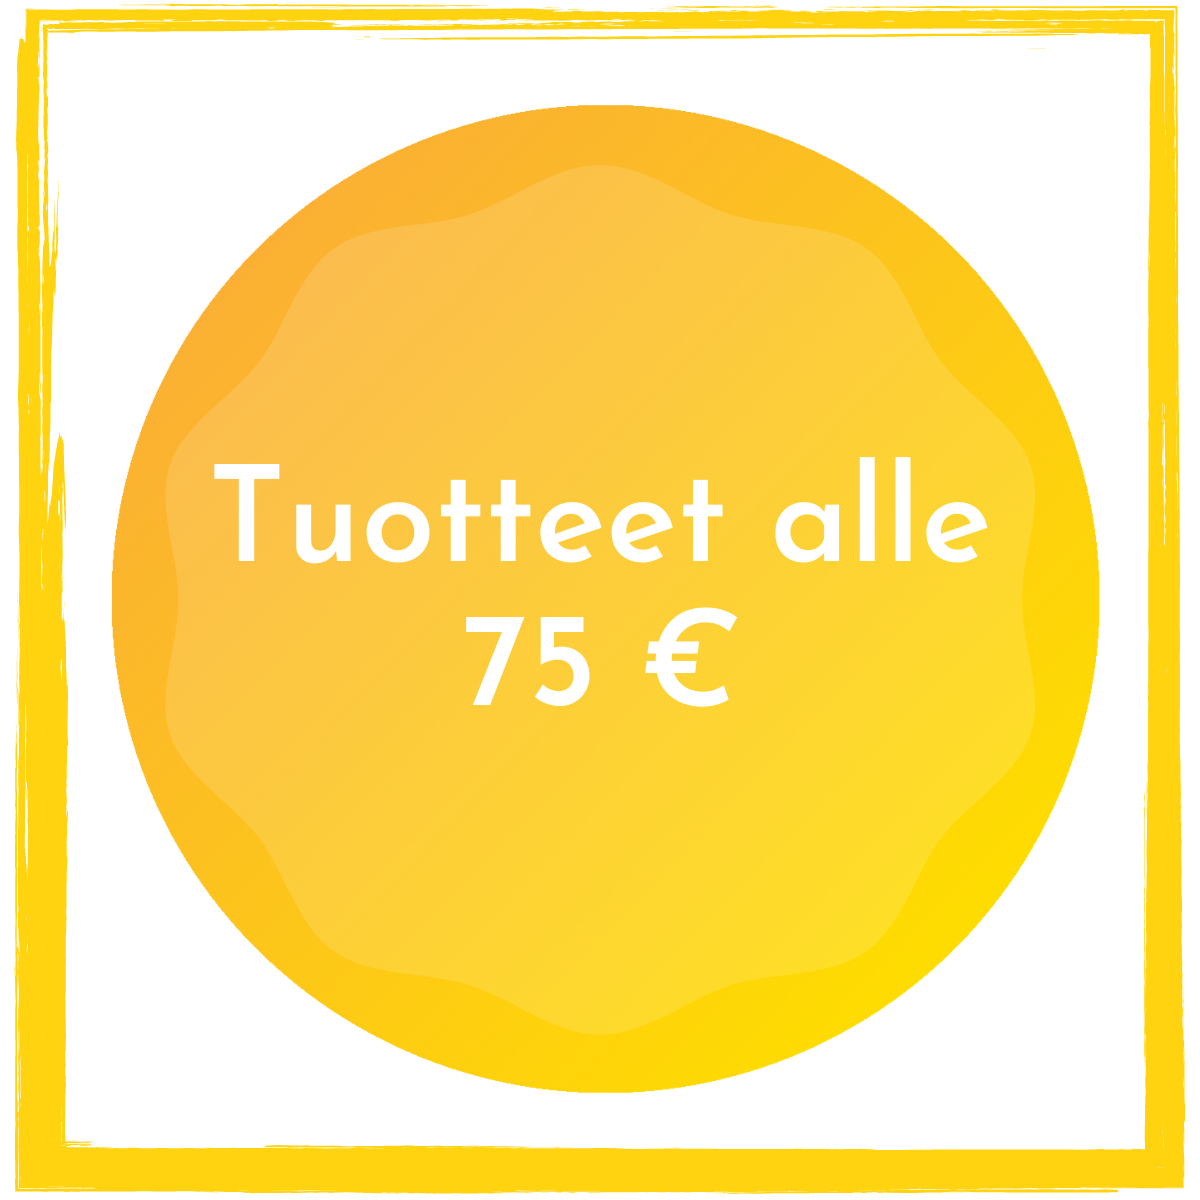 Alle 75 euroa